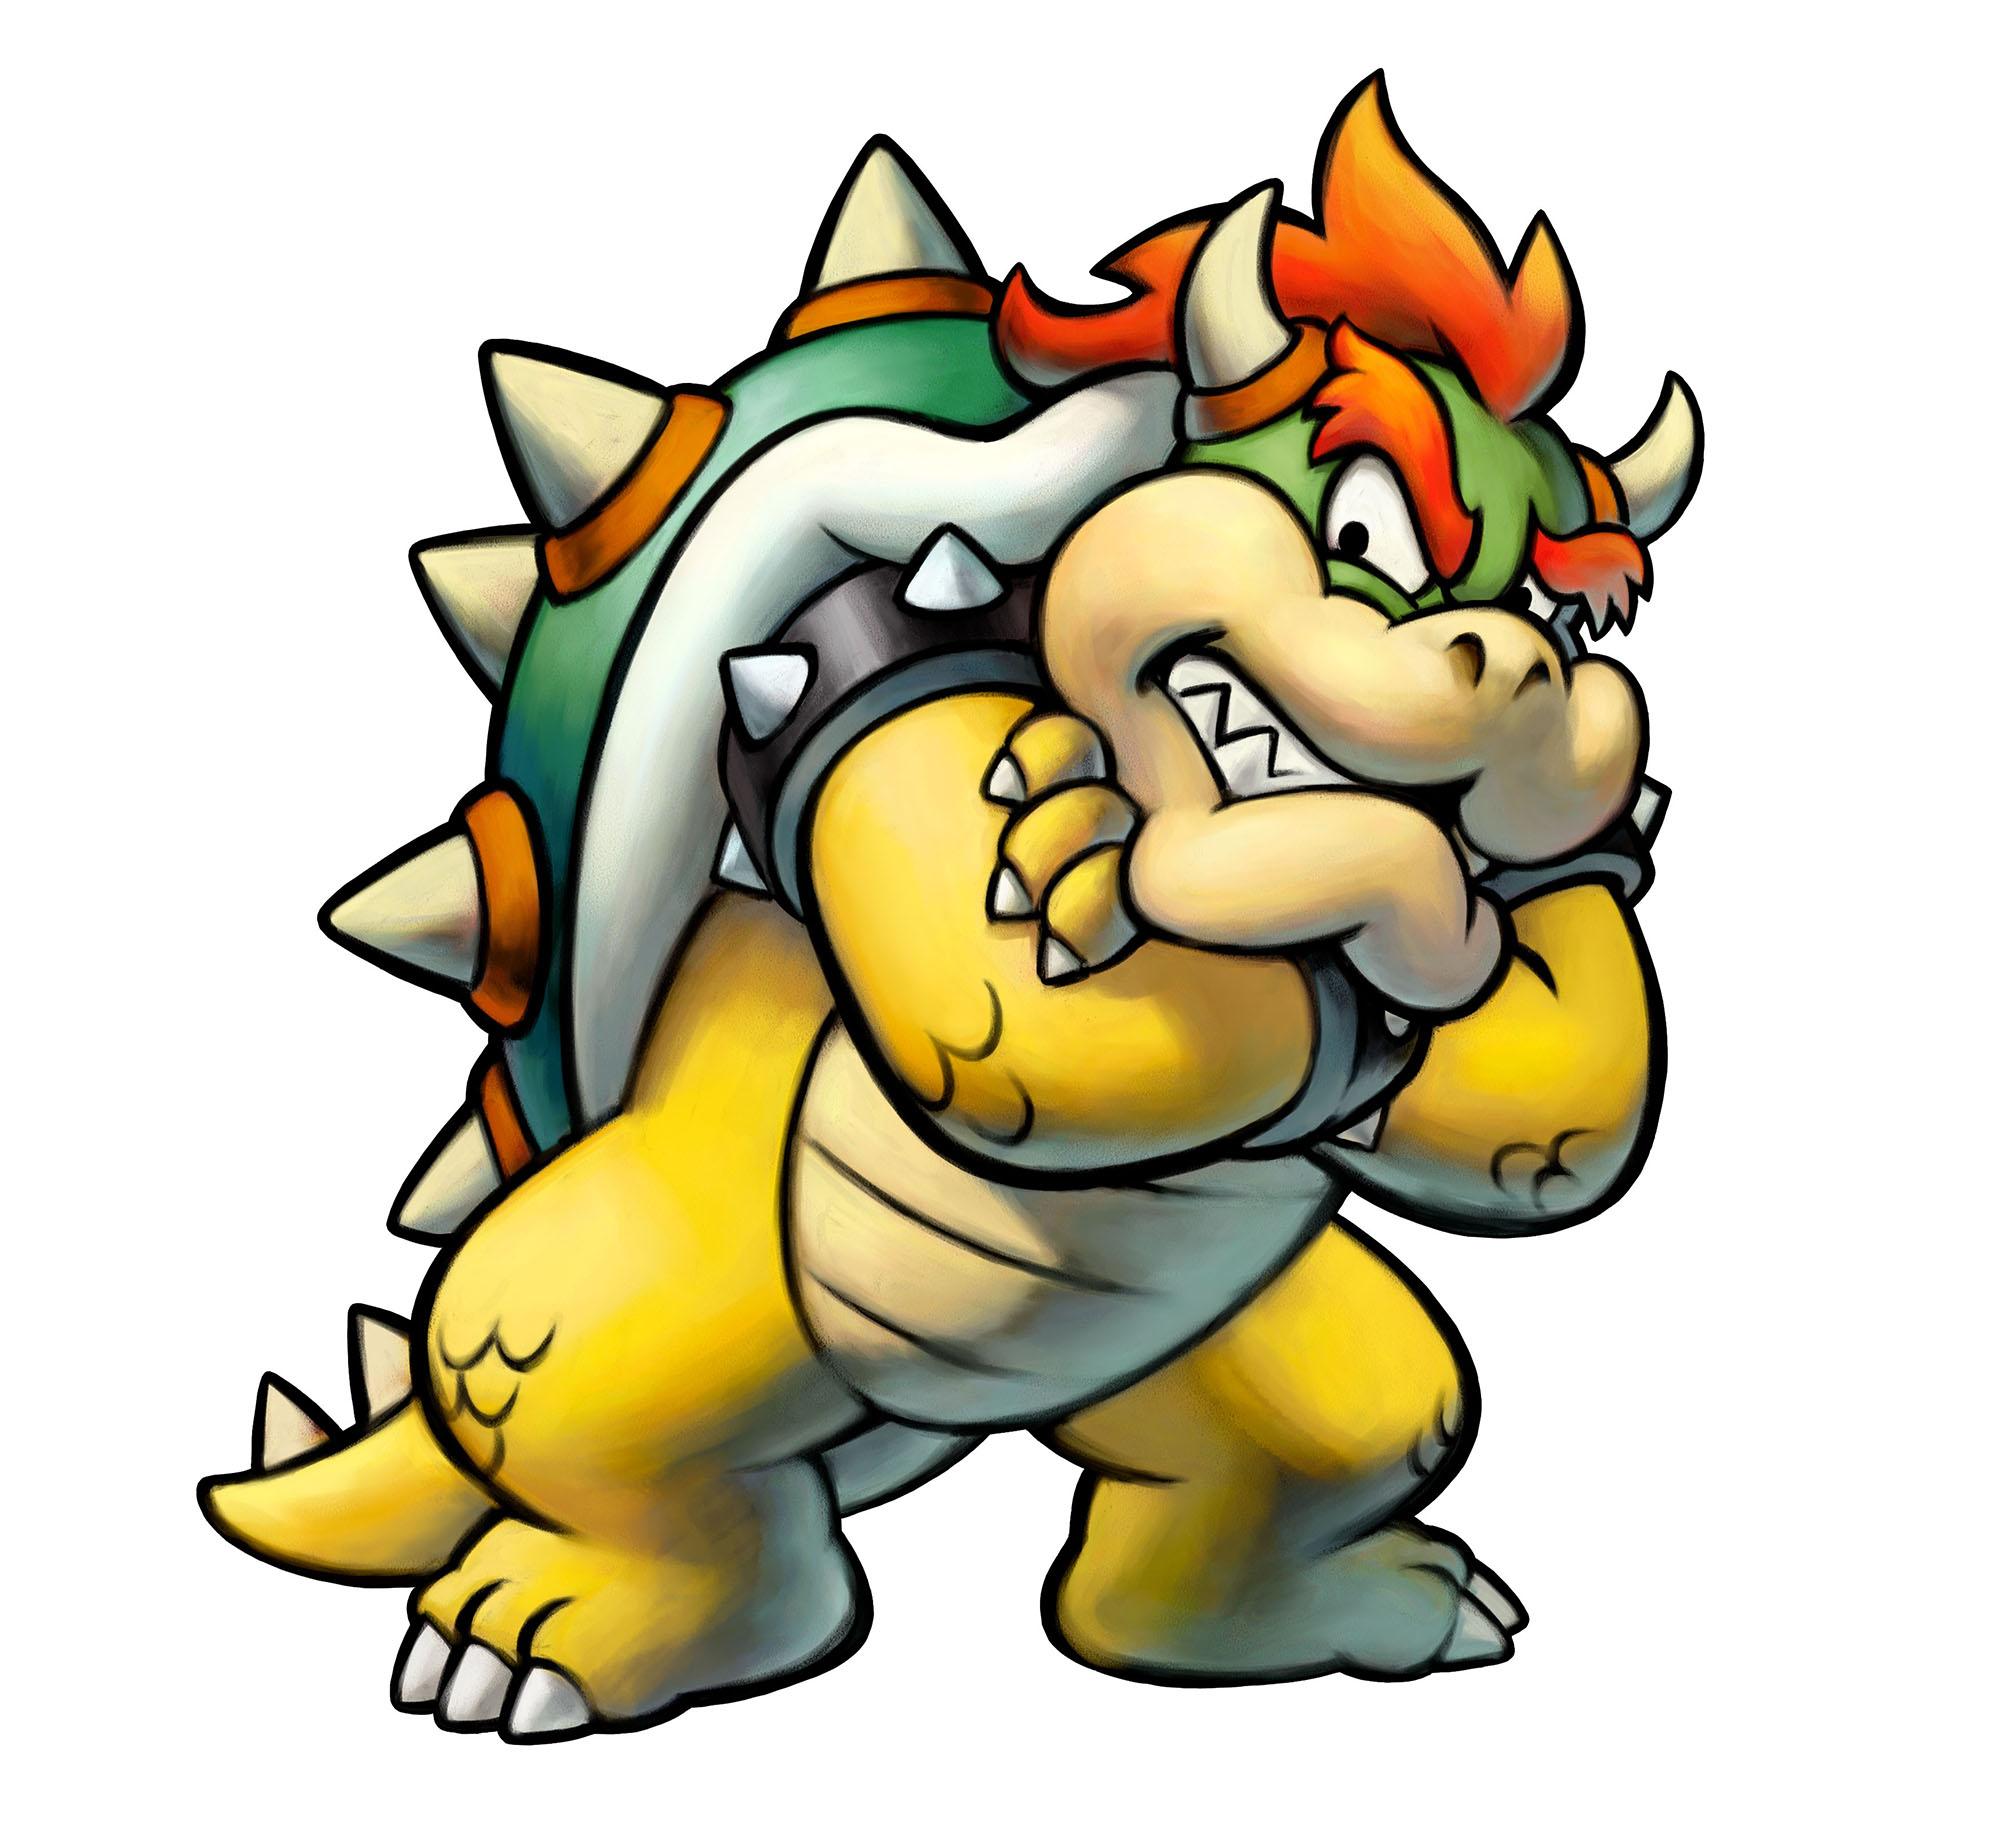 Mario Luigi Superstar Saga Bowser S Minions Art 2